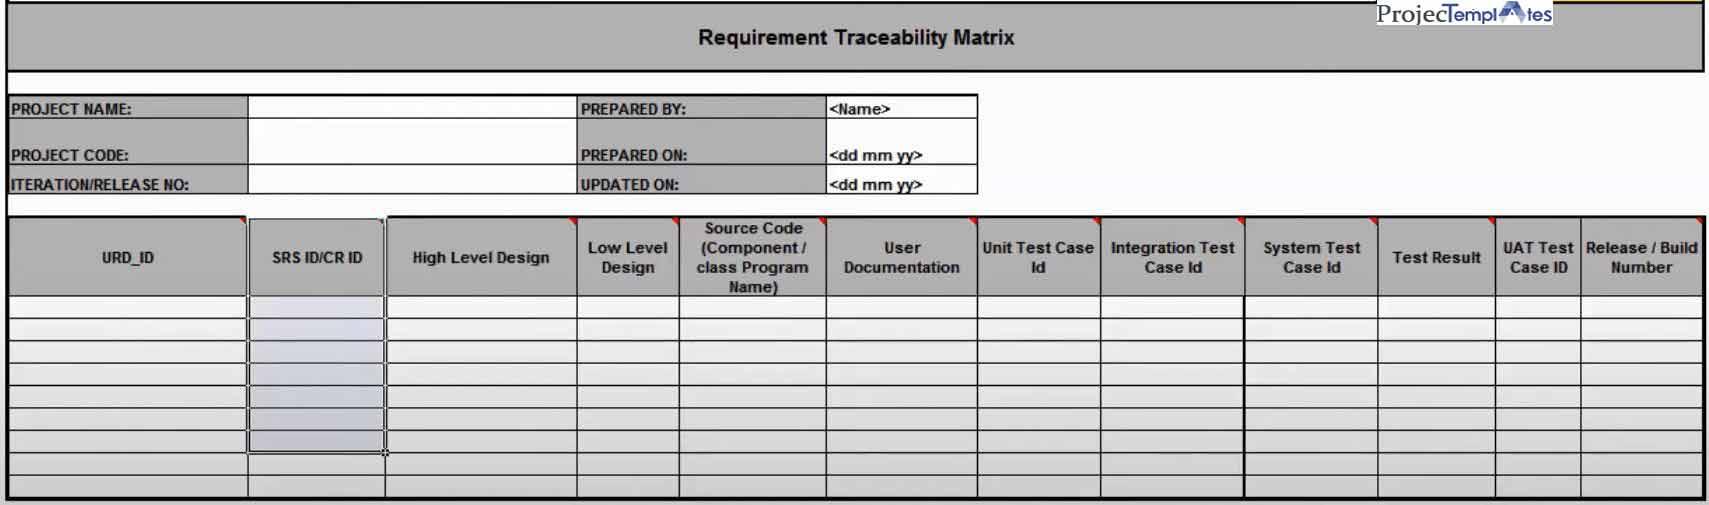 rtm Requirements Traceability Matrix Template Excel